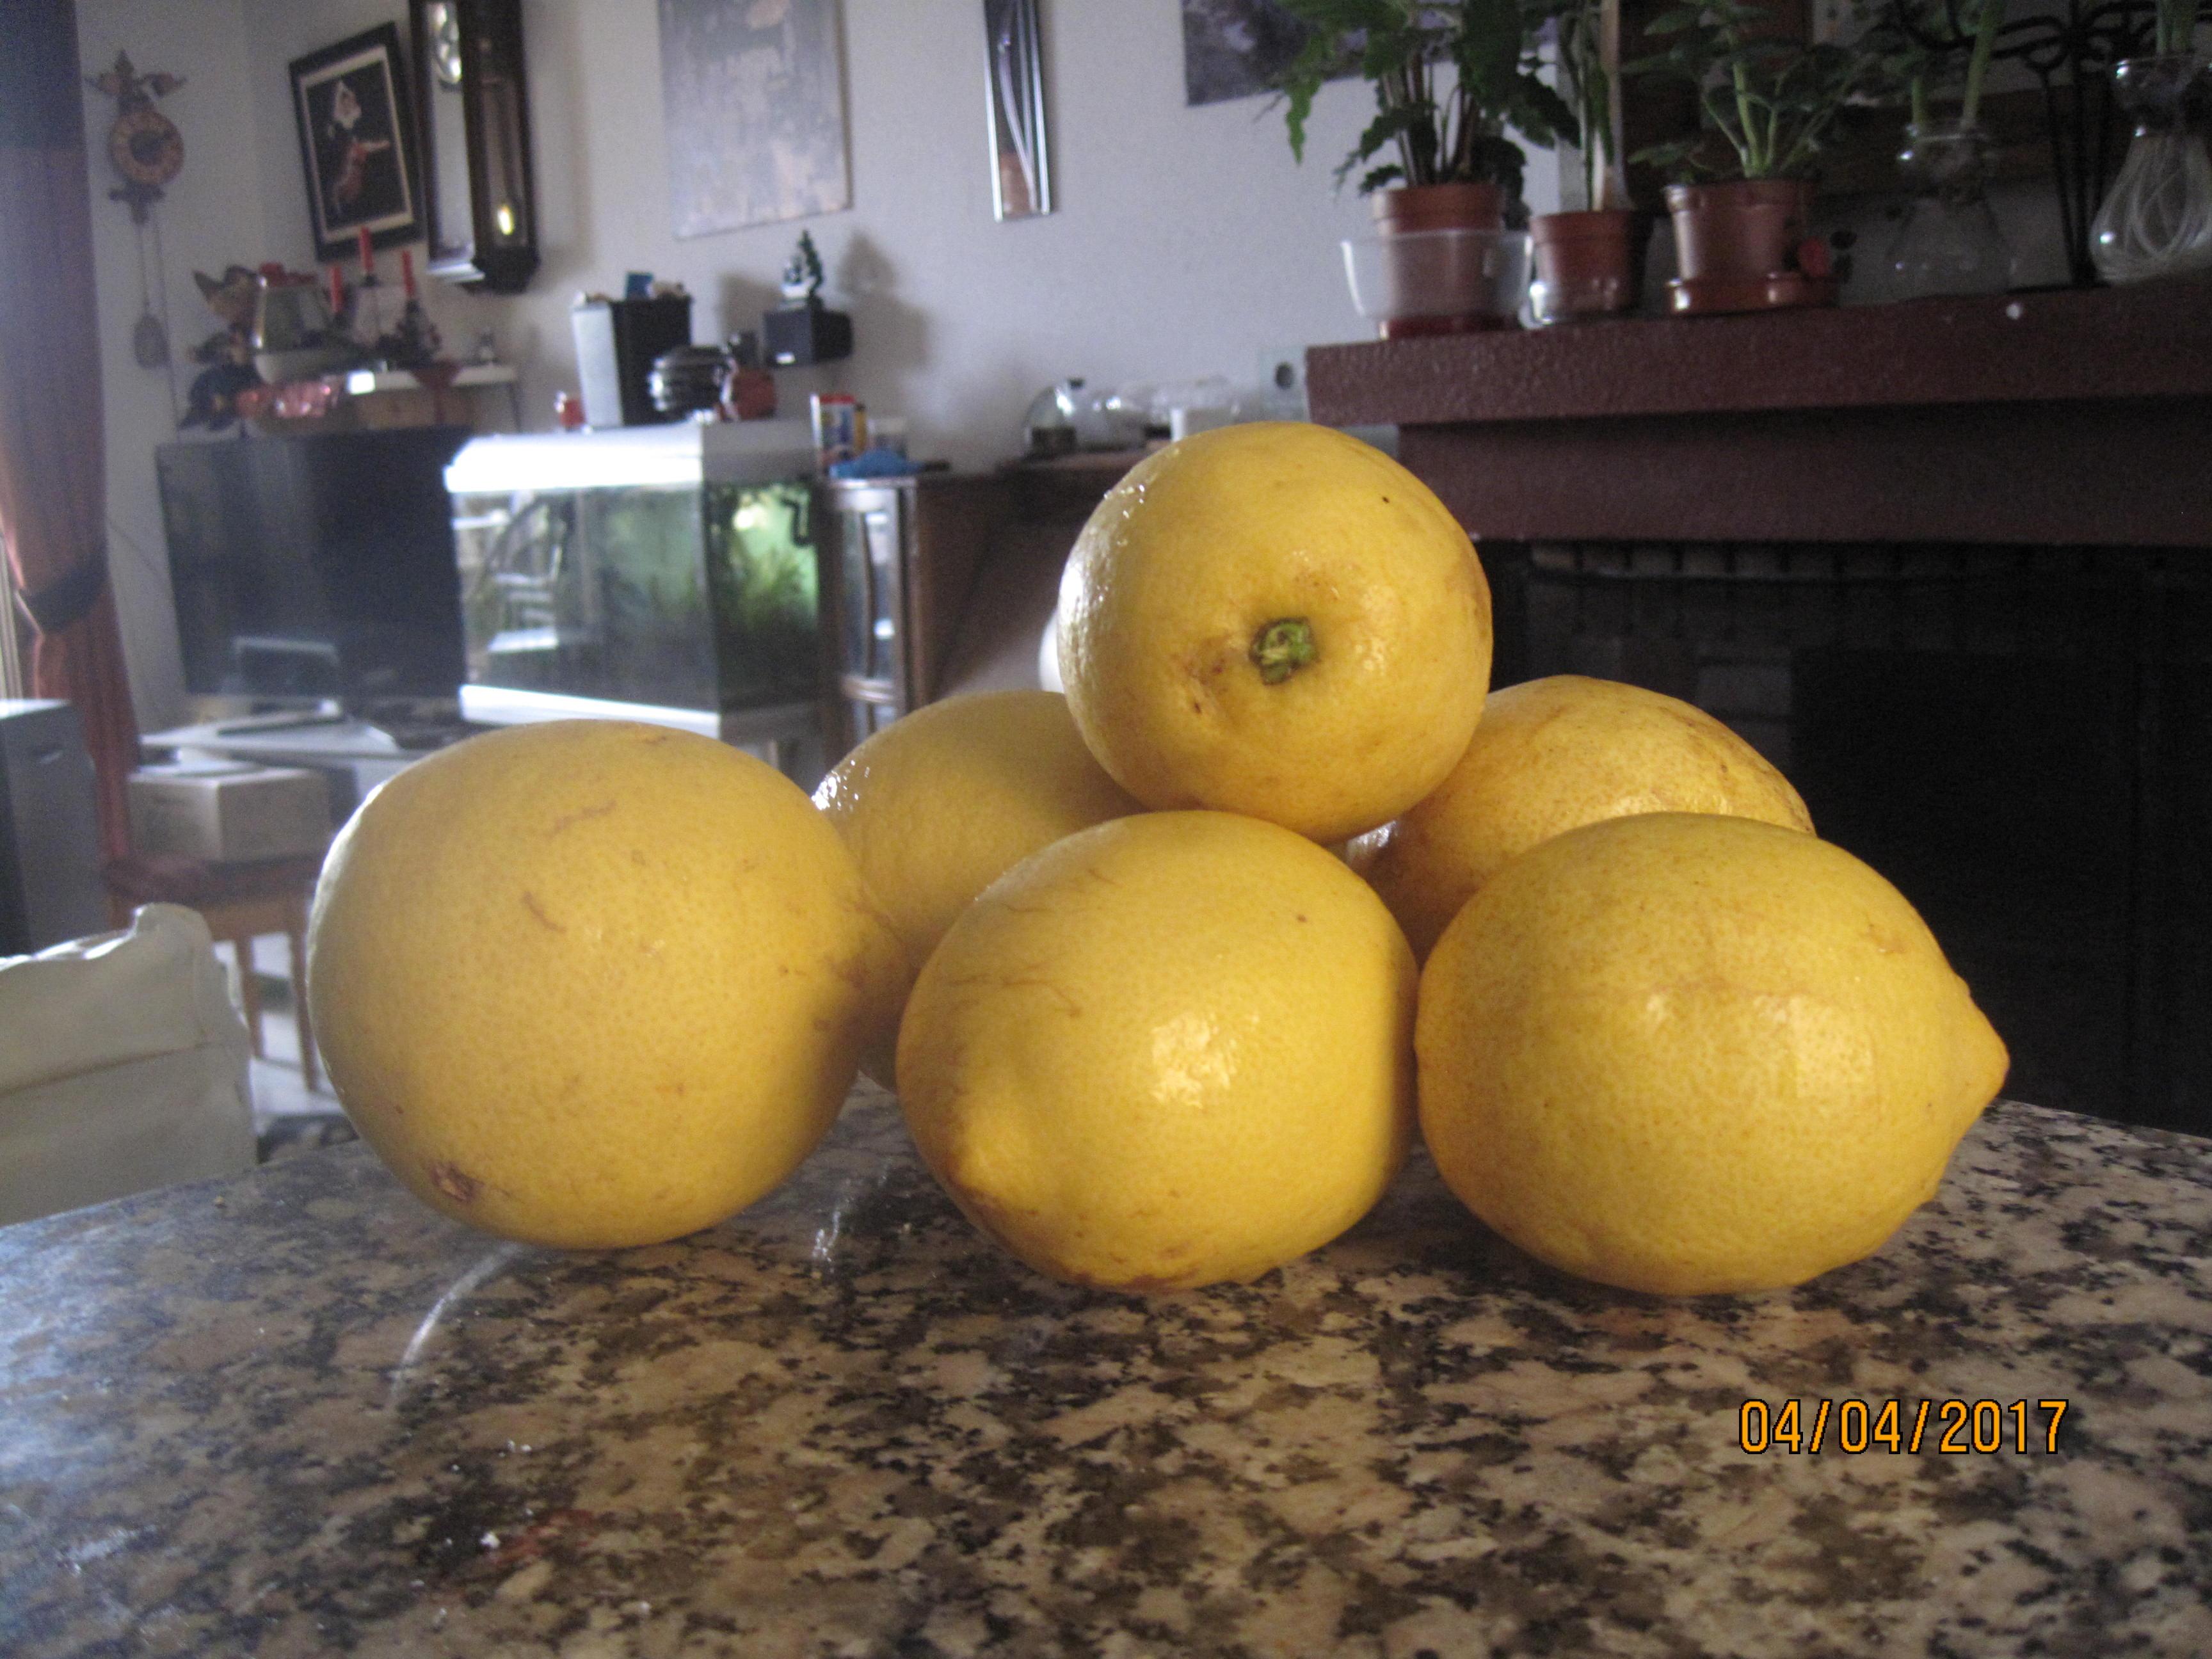 Lemon curd and marmalade 004